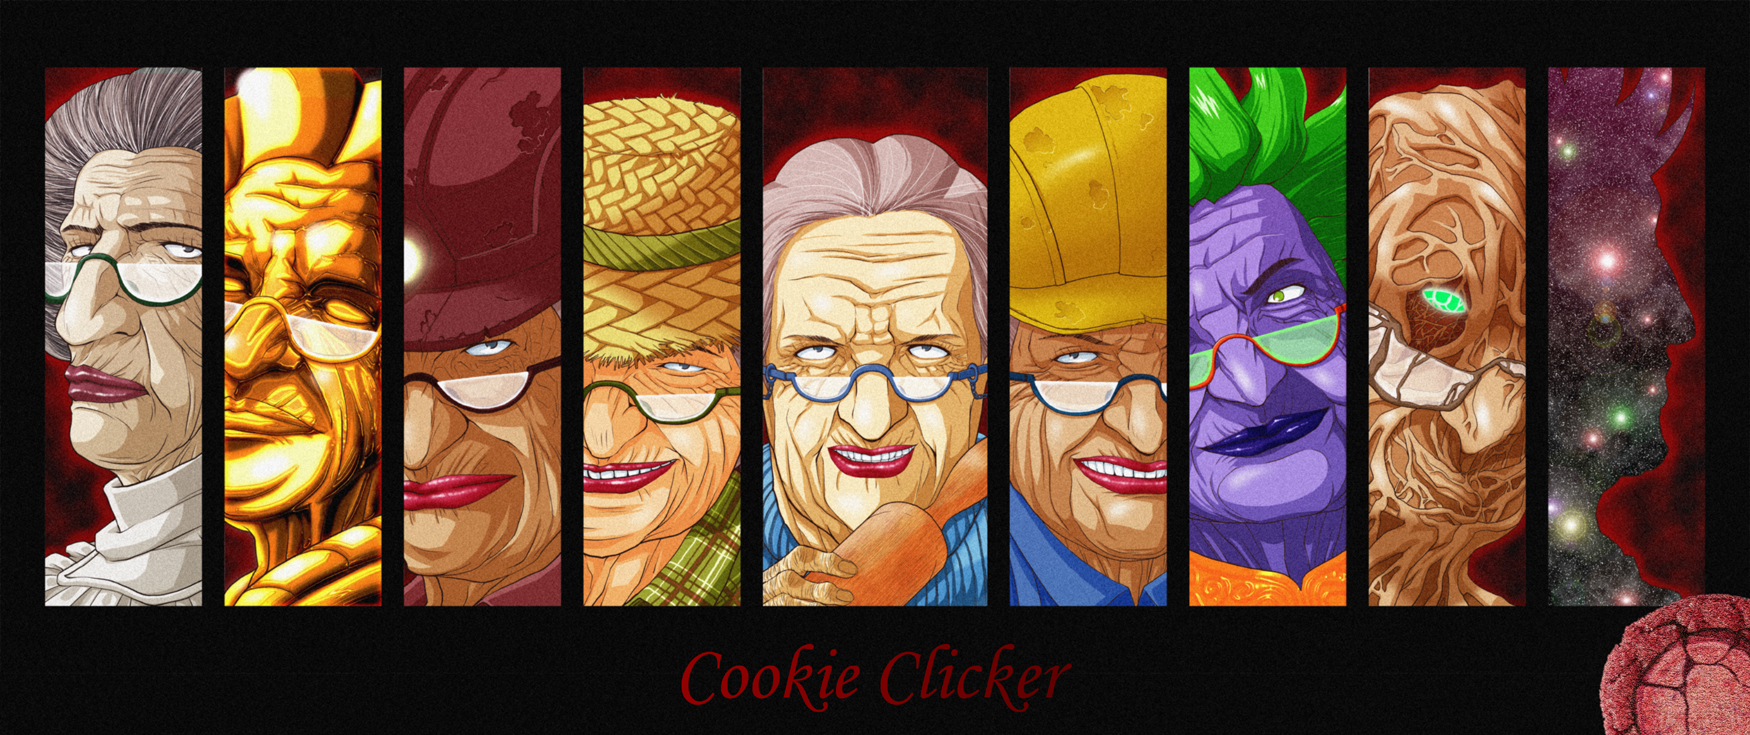 Cookie Clicker Original